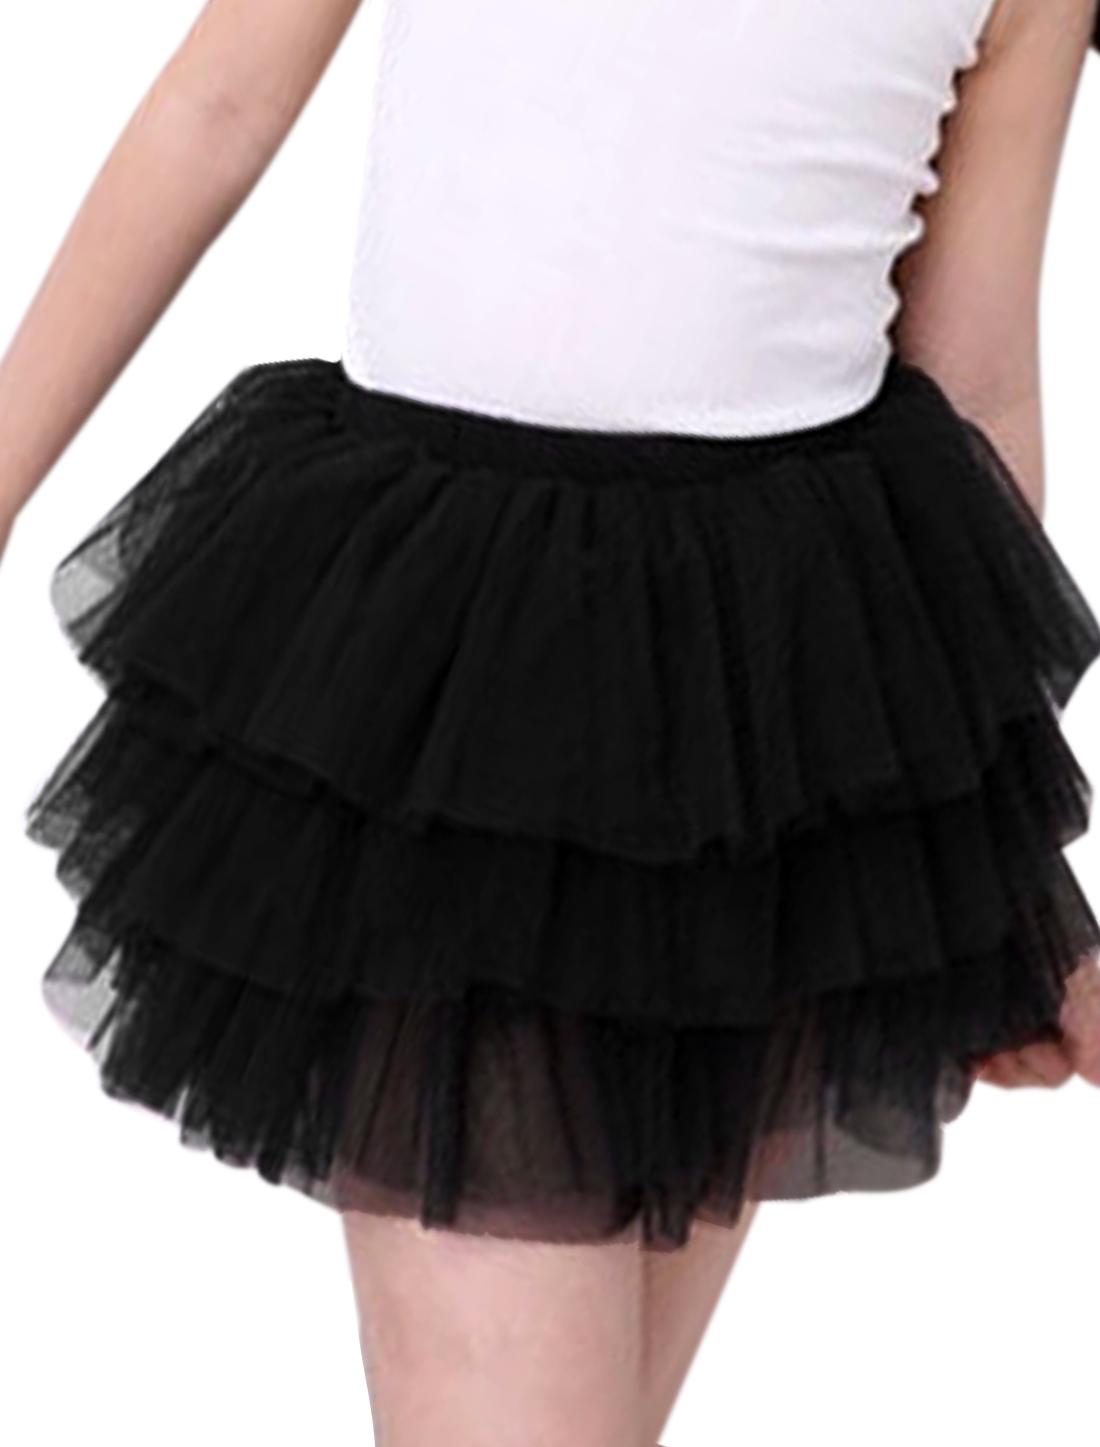 Girls Elastic Waist Mesh Panel Tiered A Line Skirt Black 6X